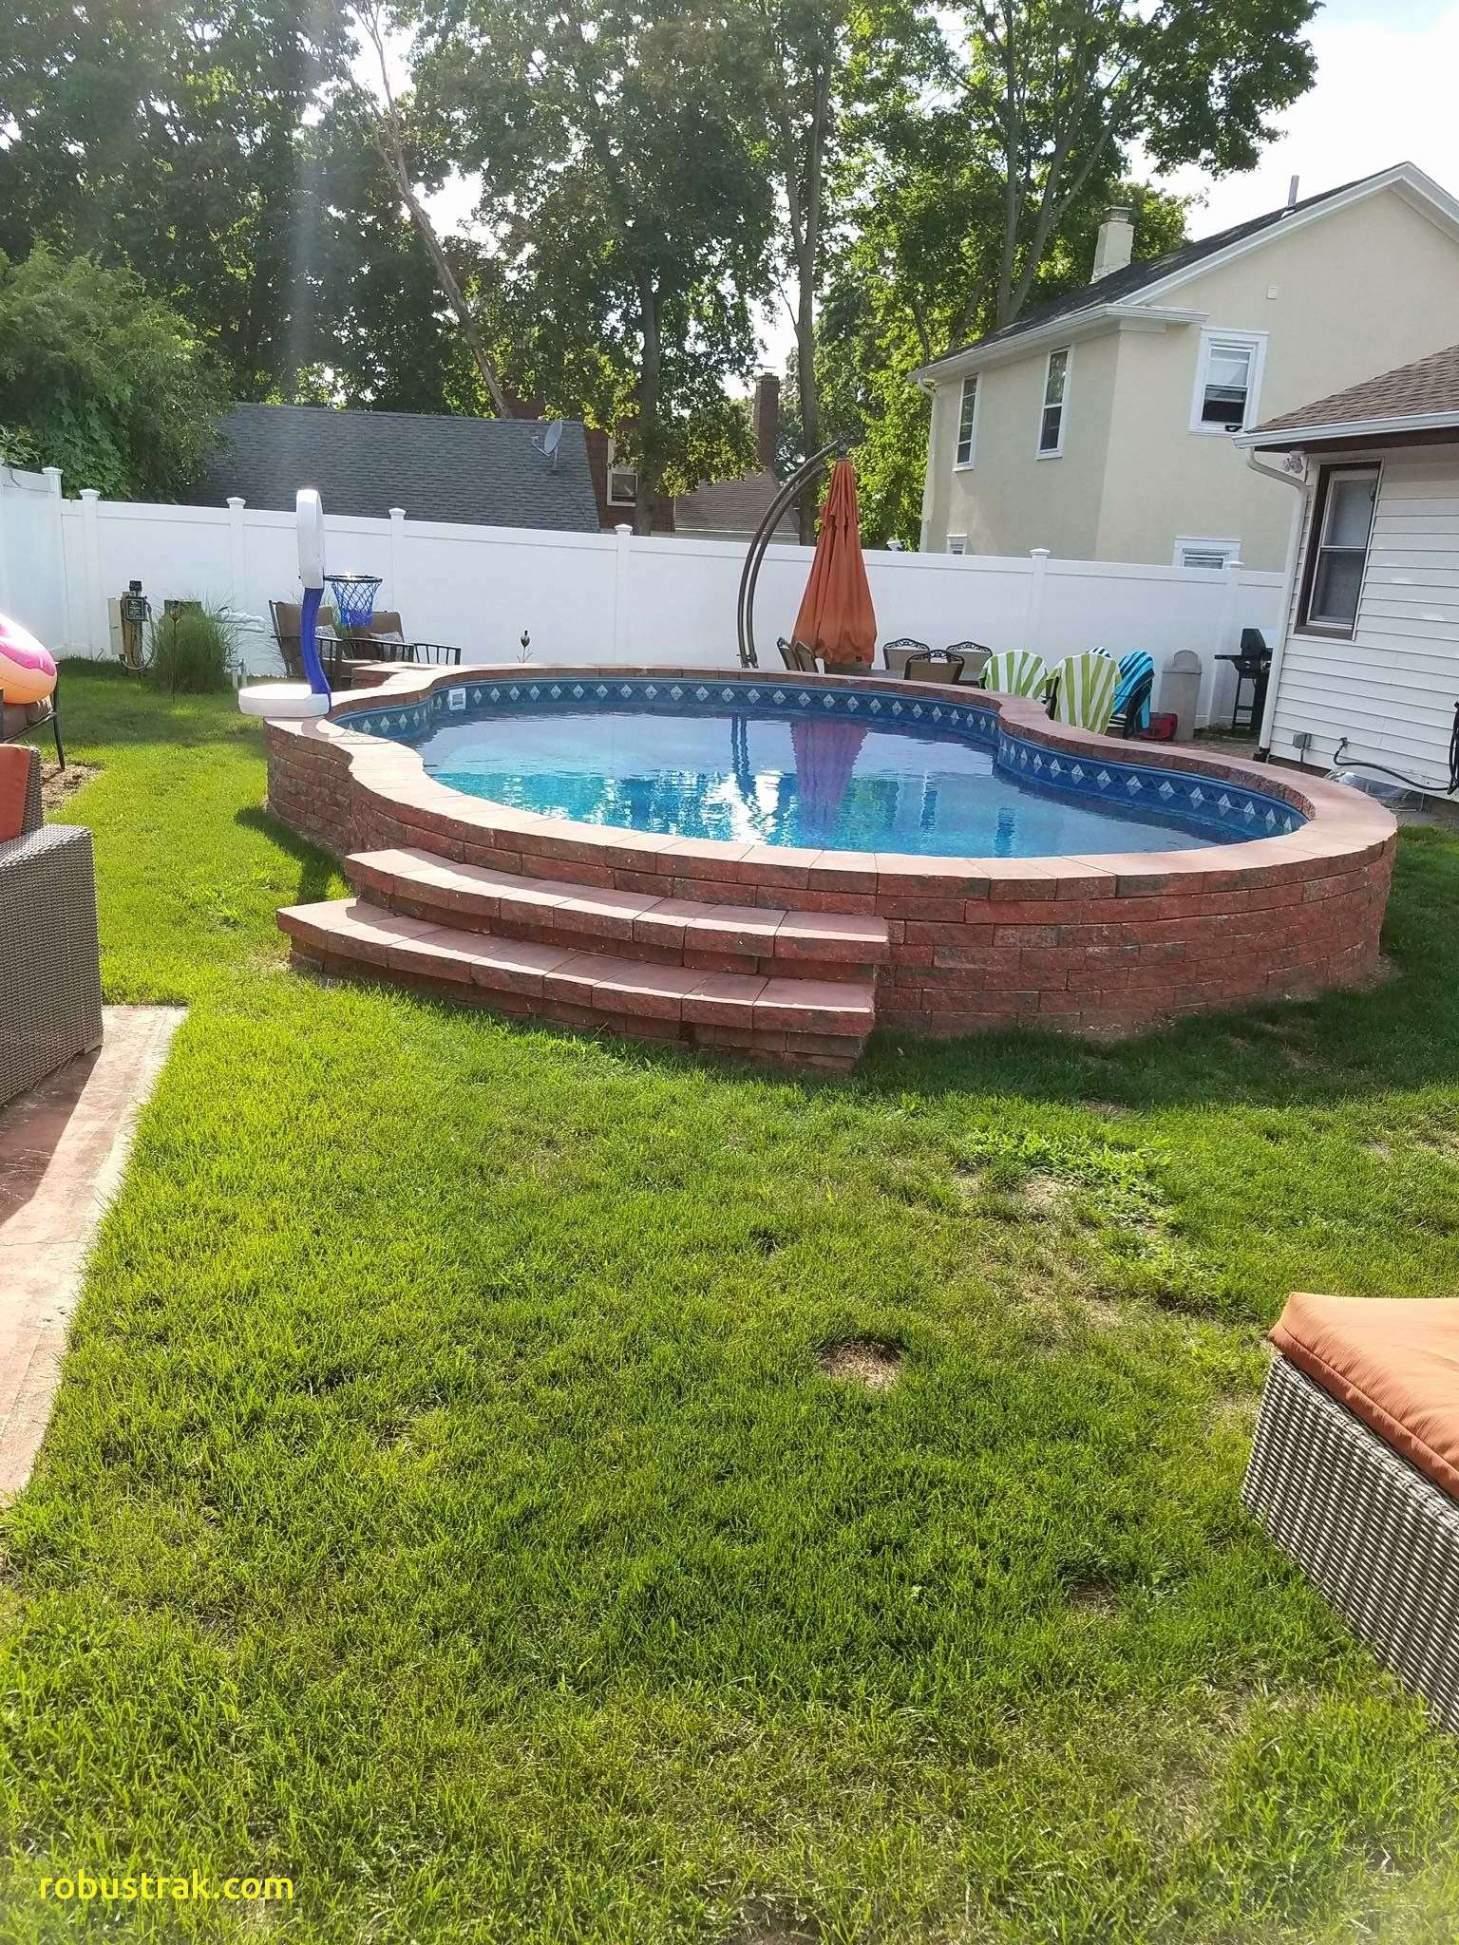 Swimmingpool Garten Inspirierend Pool Kleiner Garten — Temobardz Home Blog